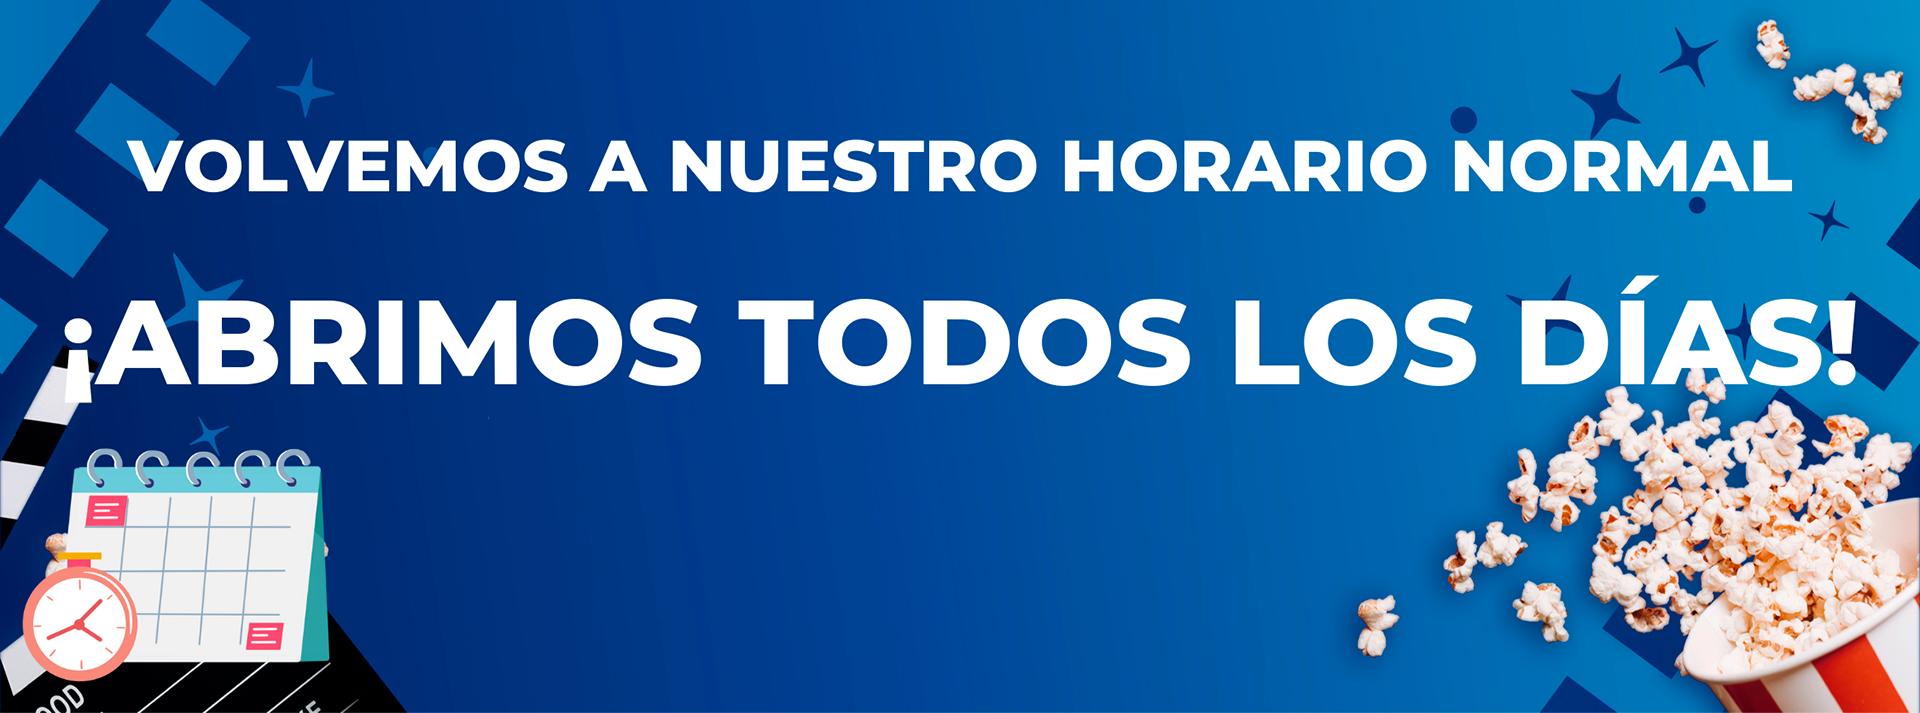 Banner_Ajustado